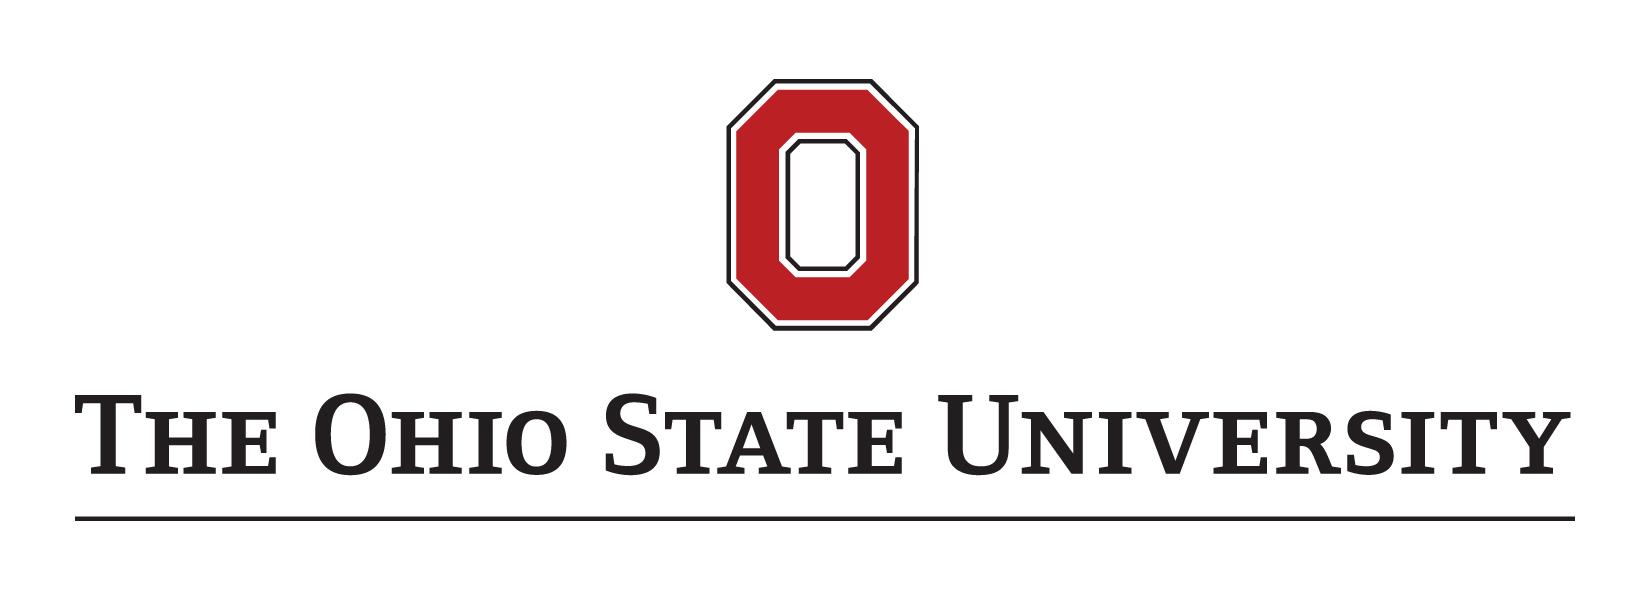 OSU - collegecliffs.com